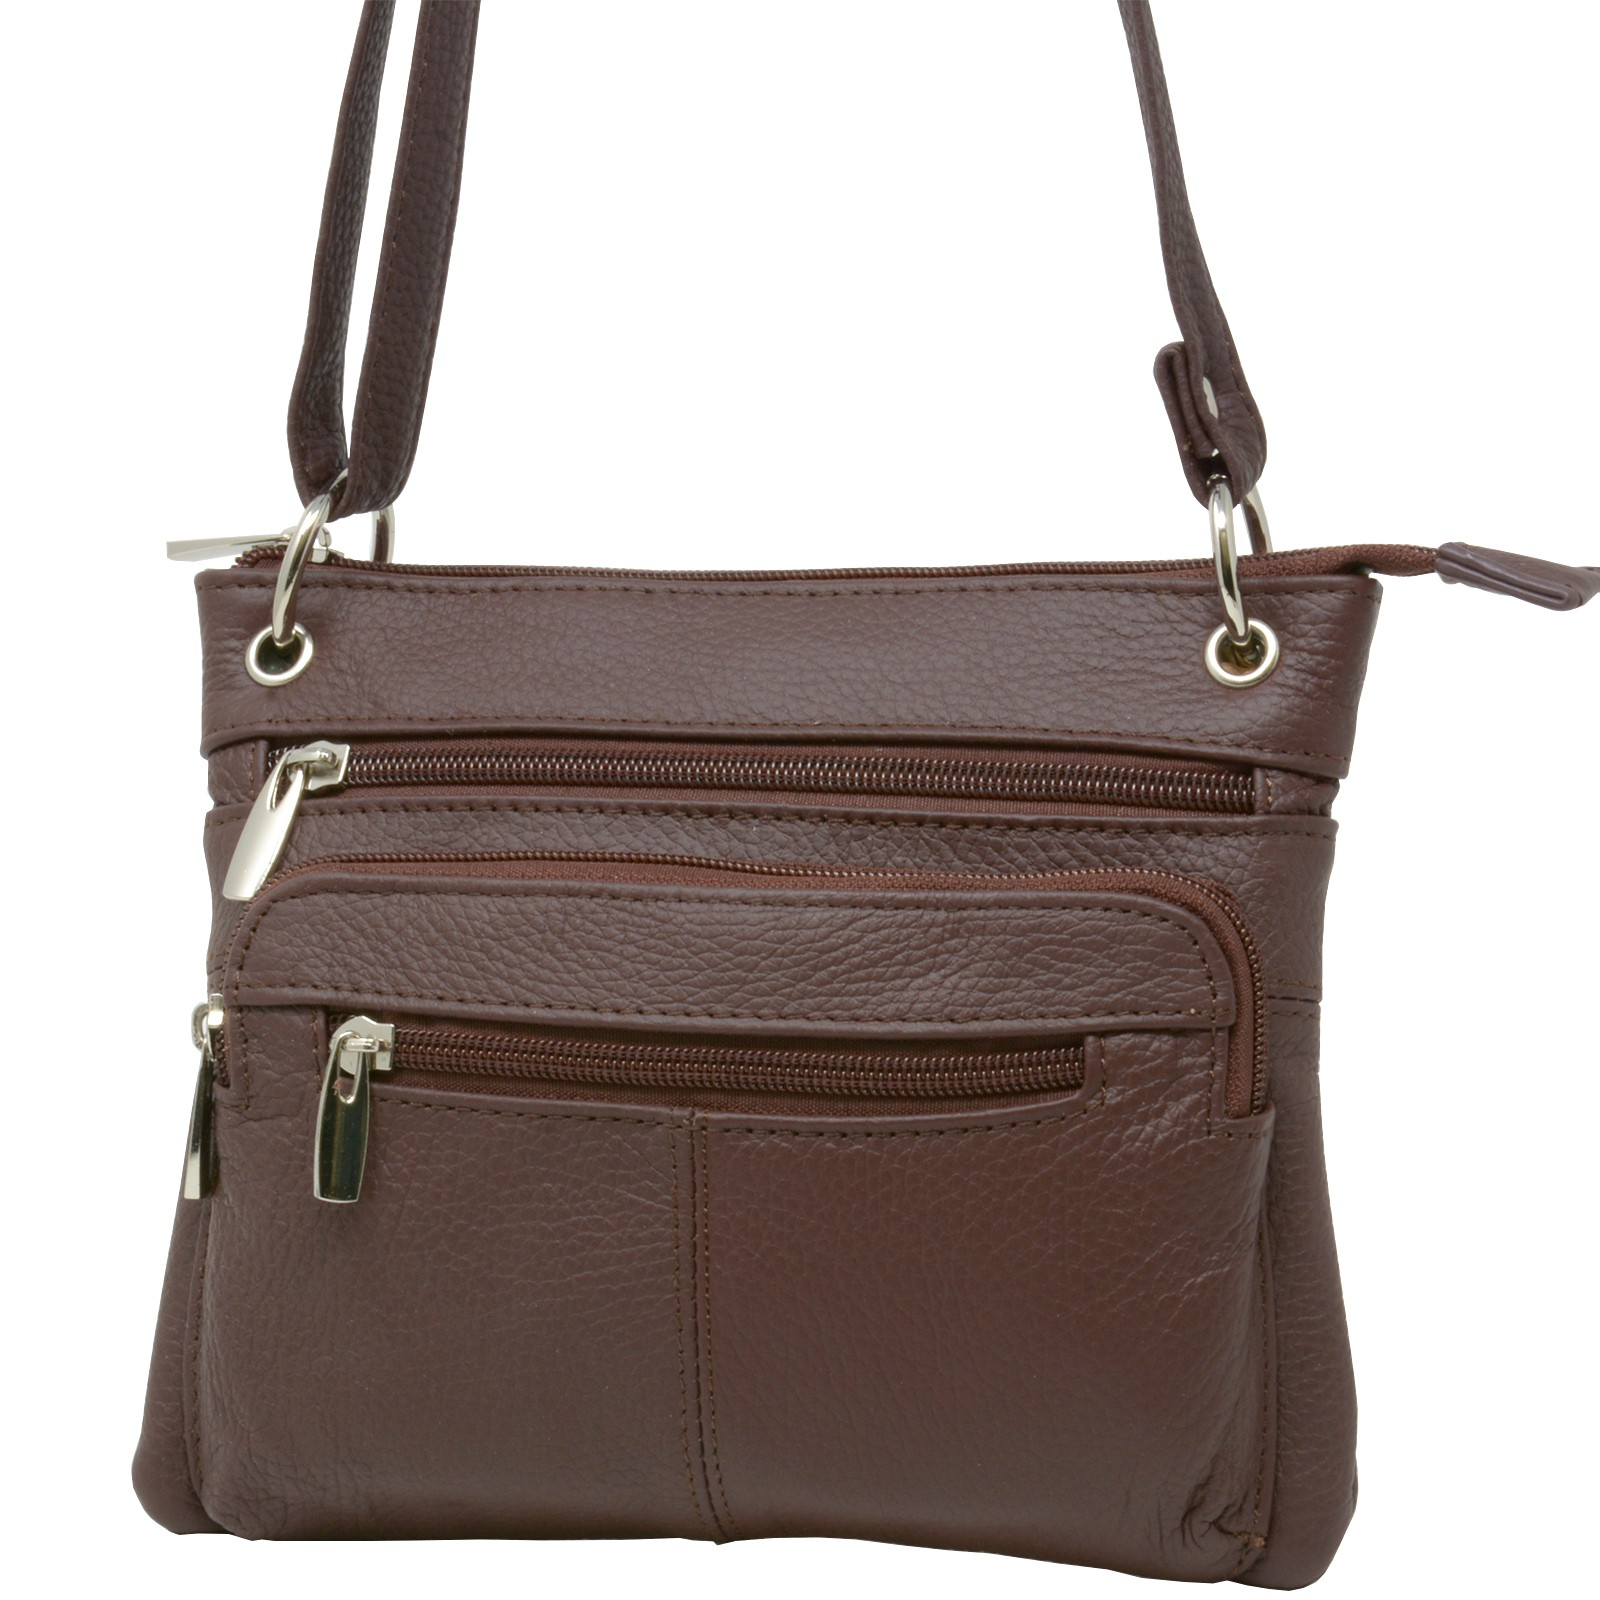 Women s Leather Purse Cross Body Shoulder Bag Handbag Organizer  4caefbf44312d